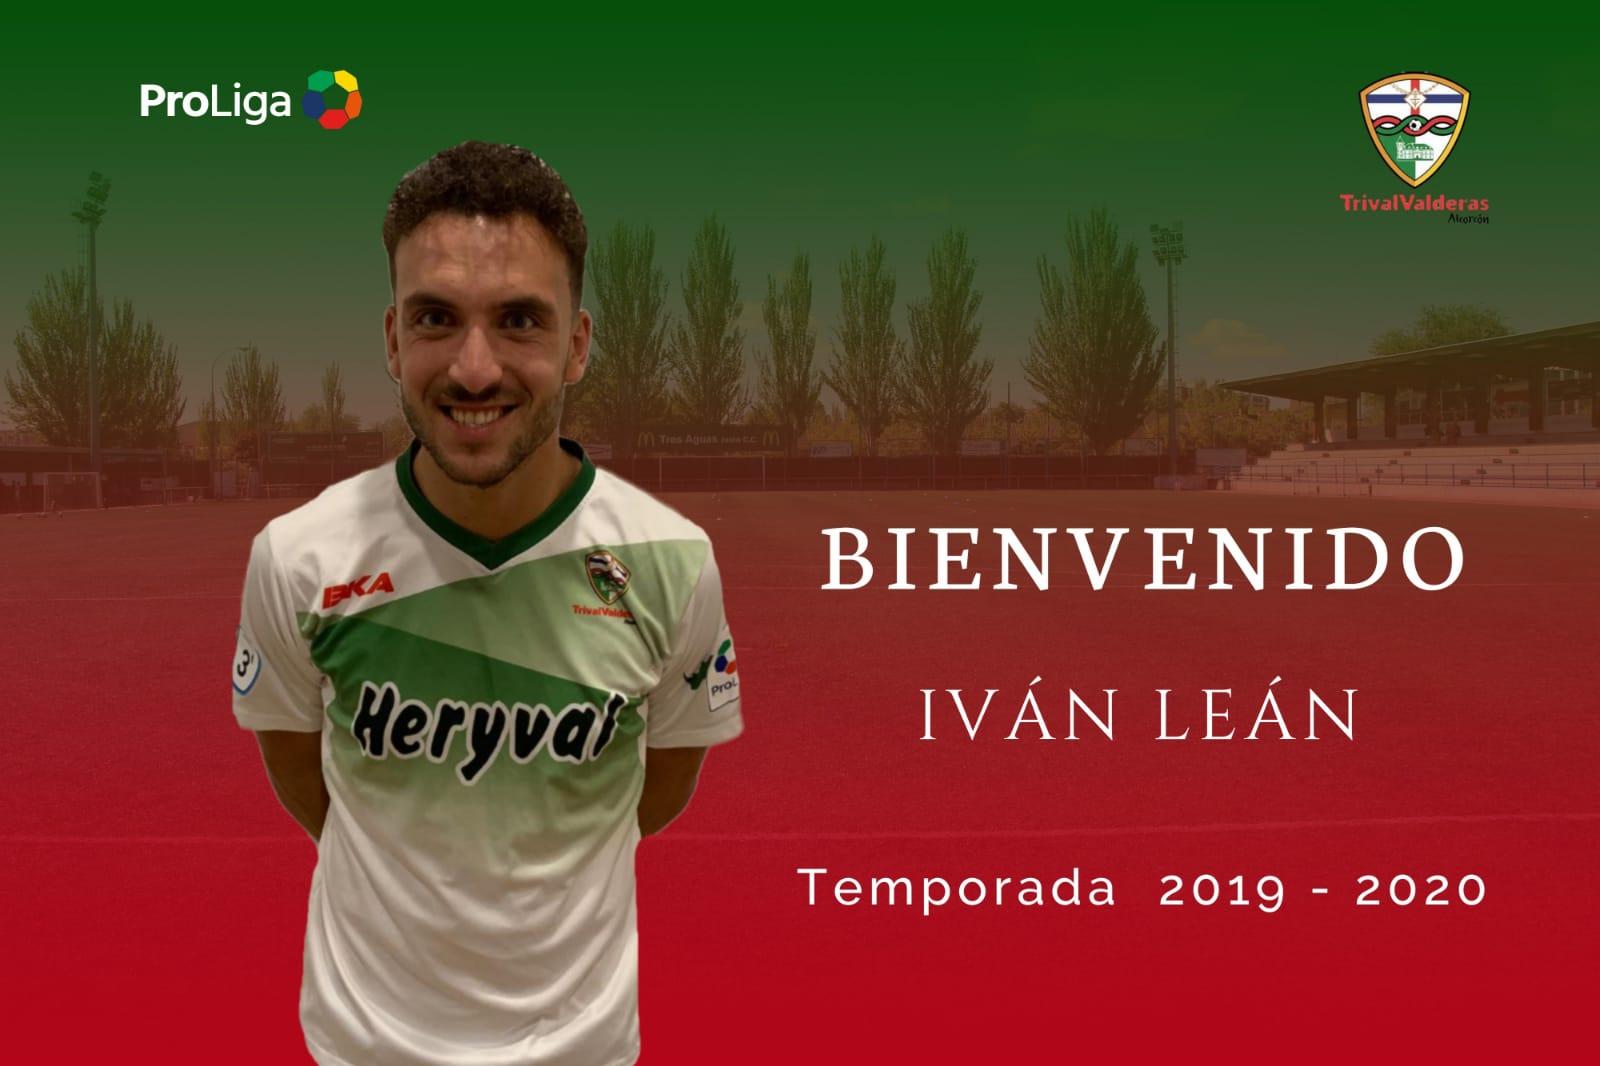 OFICIAL | Iván Leán, octava incorporación del Primer Equipo